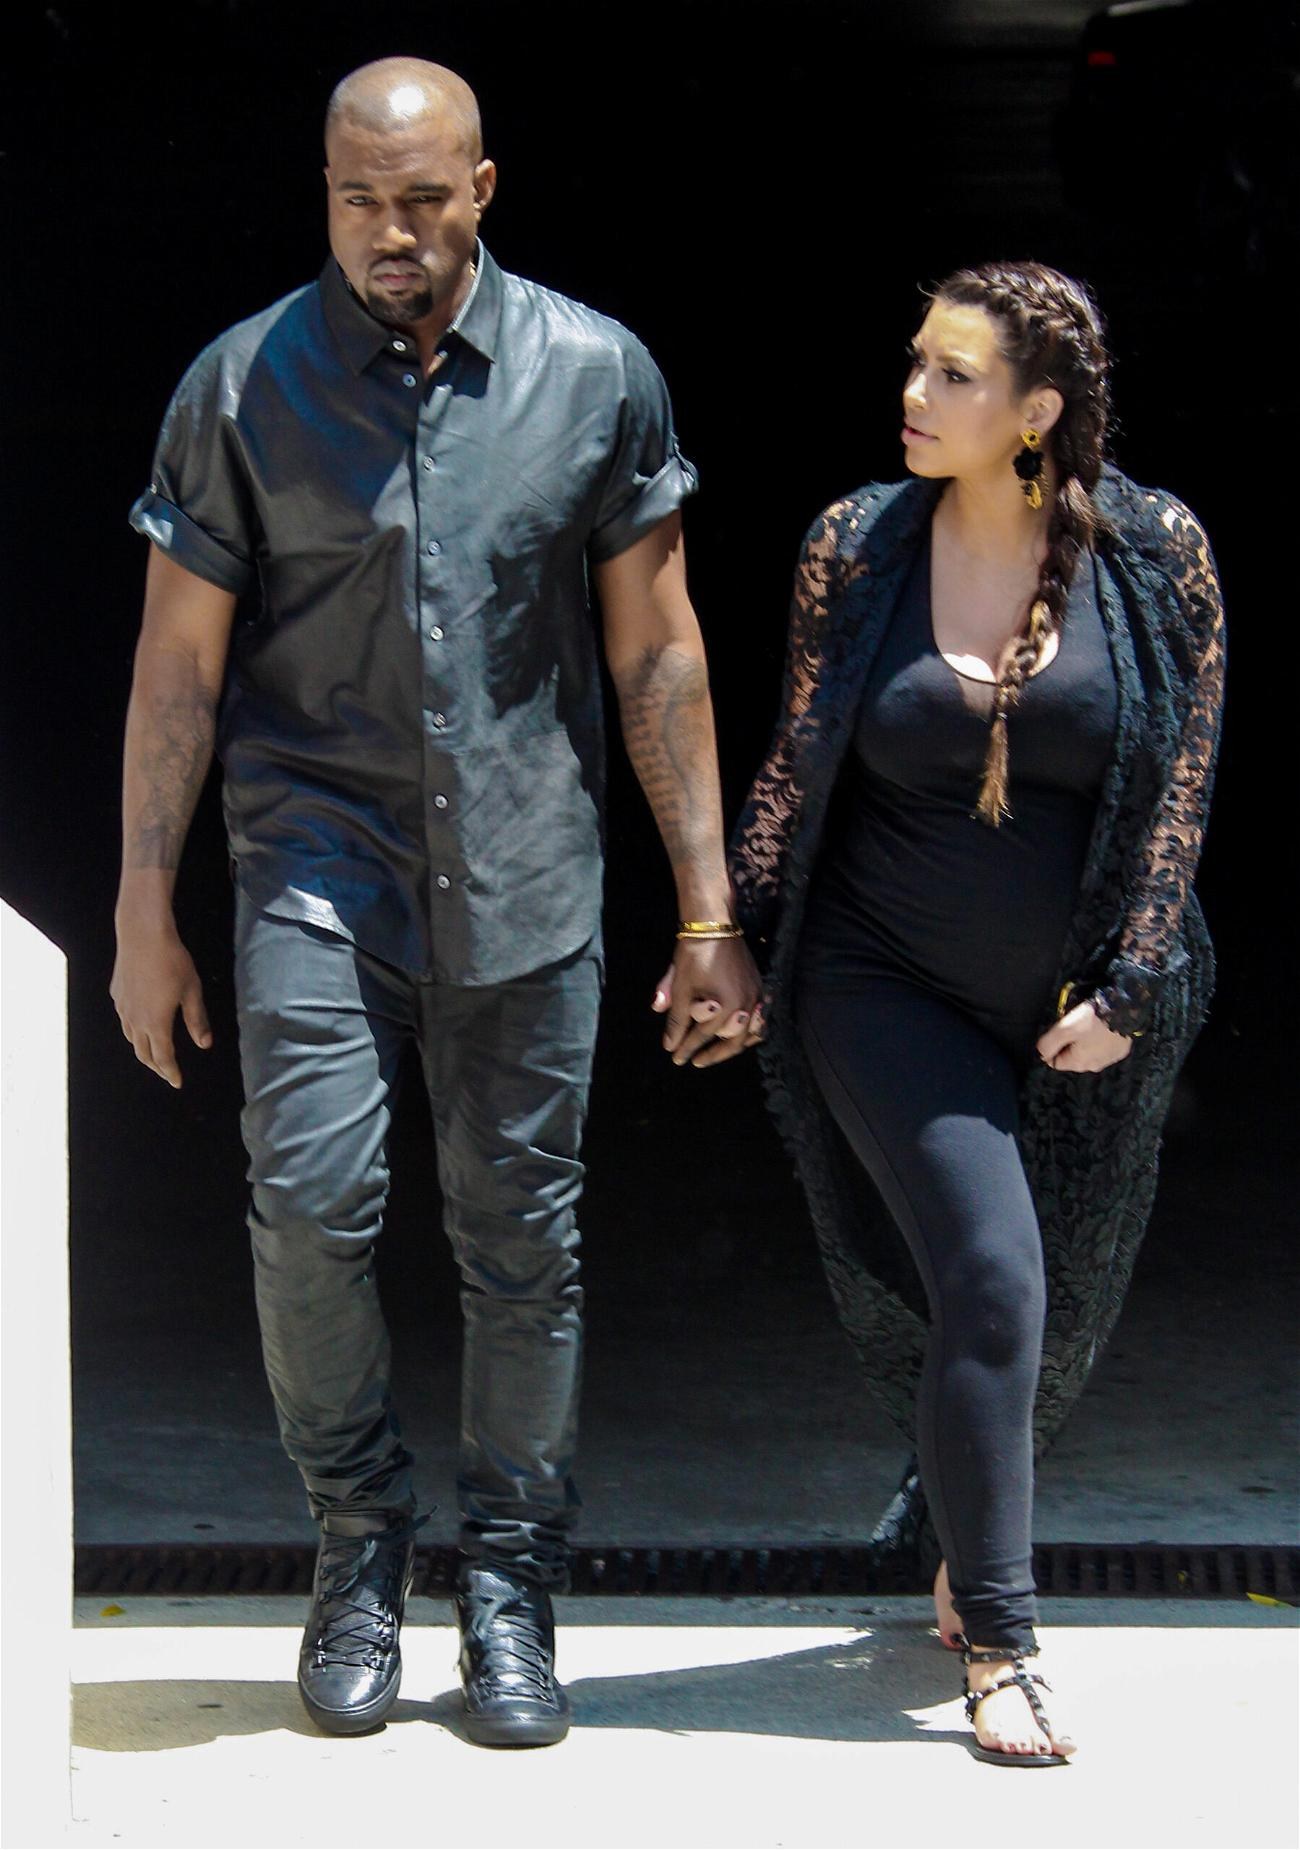 Kanye West And Kim Kardashian Take Family Vacation Amid Divorce